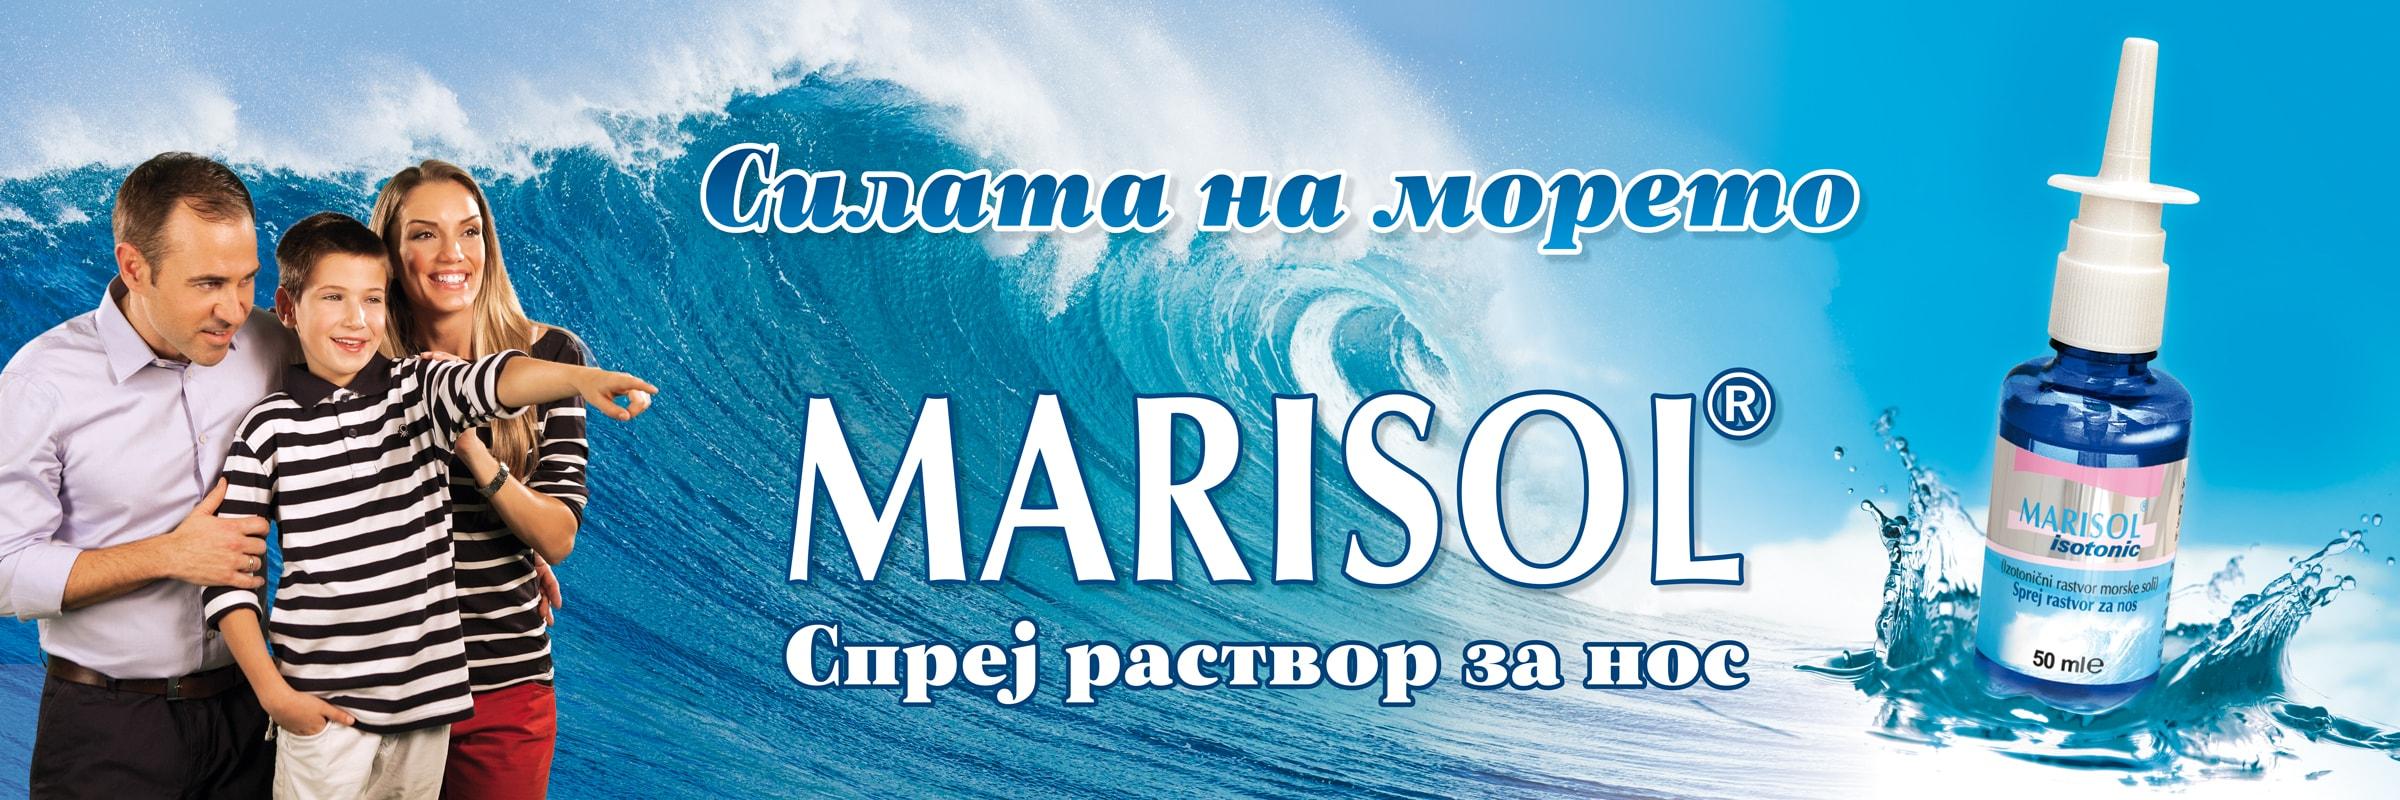 Marisoli